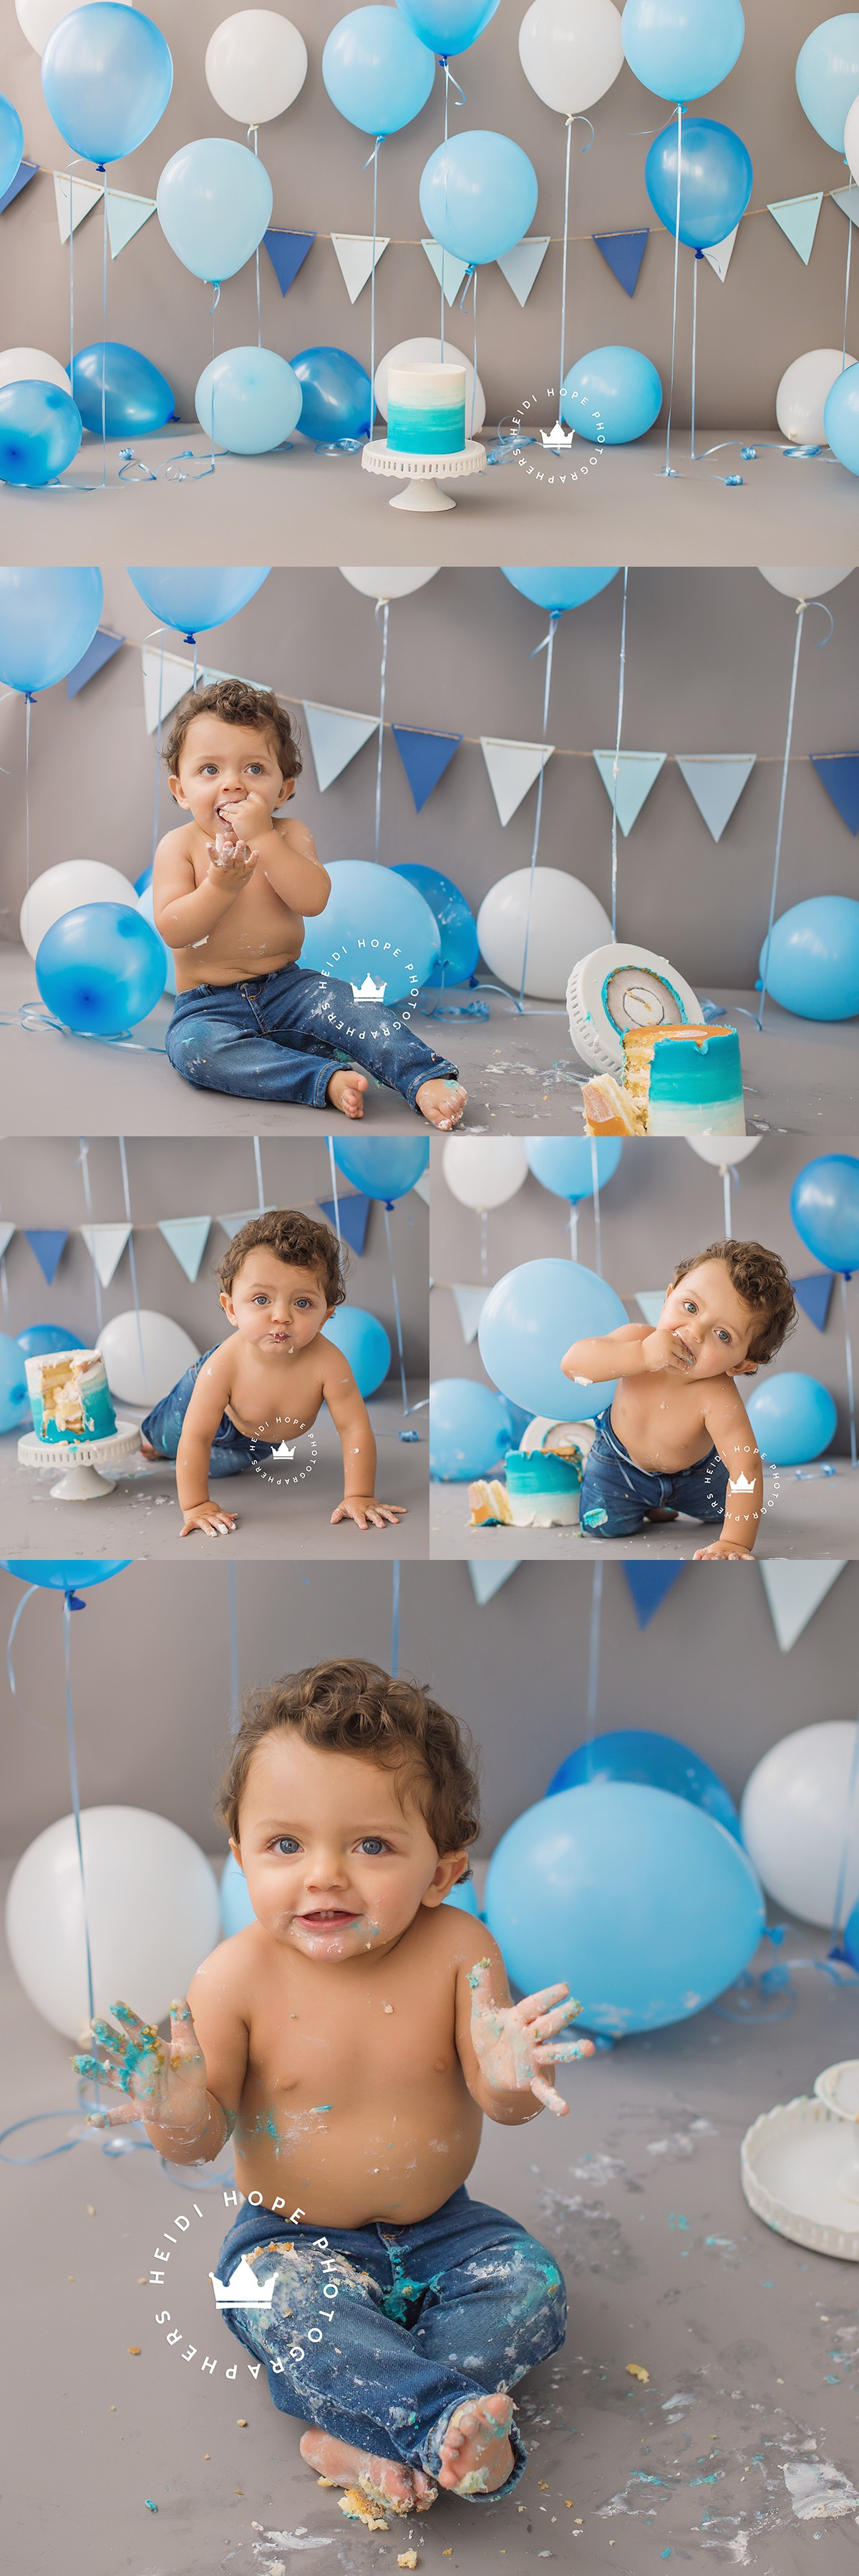 heidi hope first birthday photography